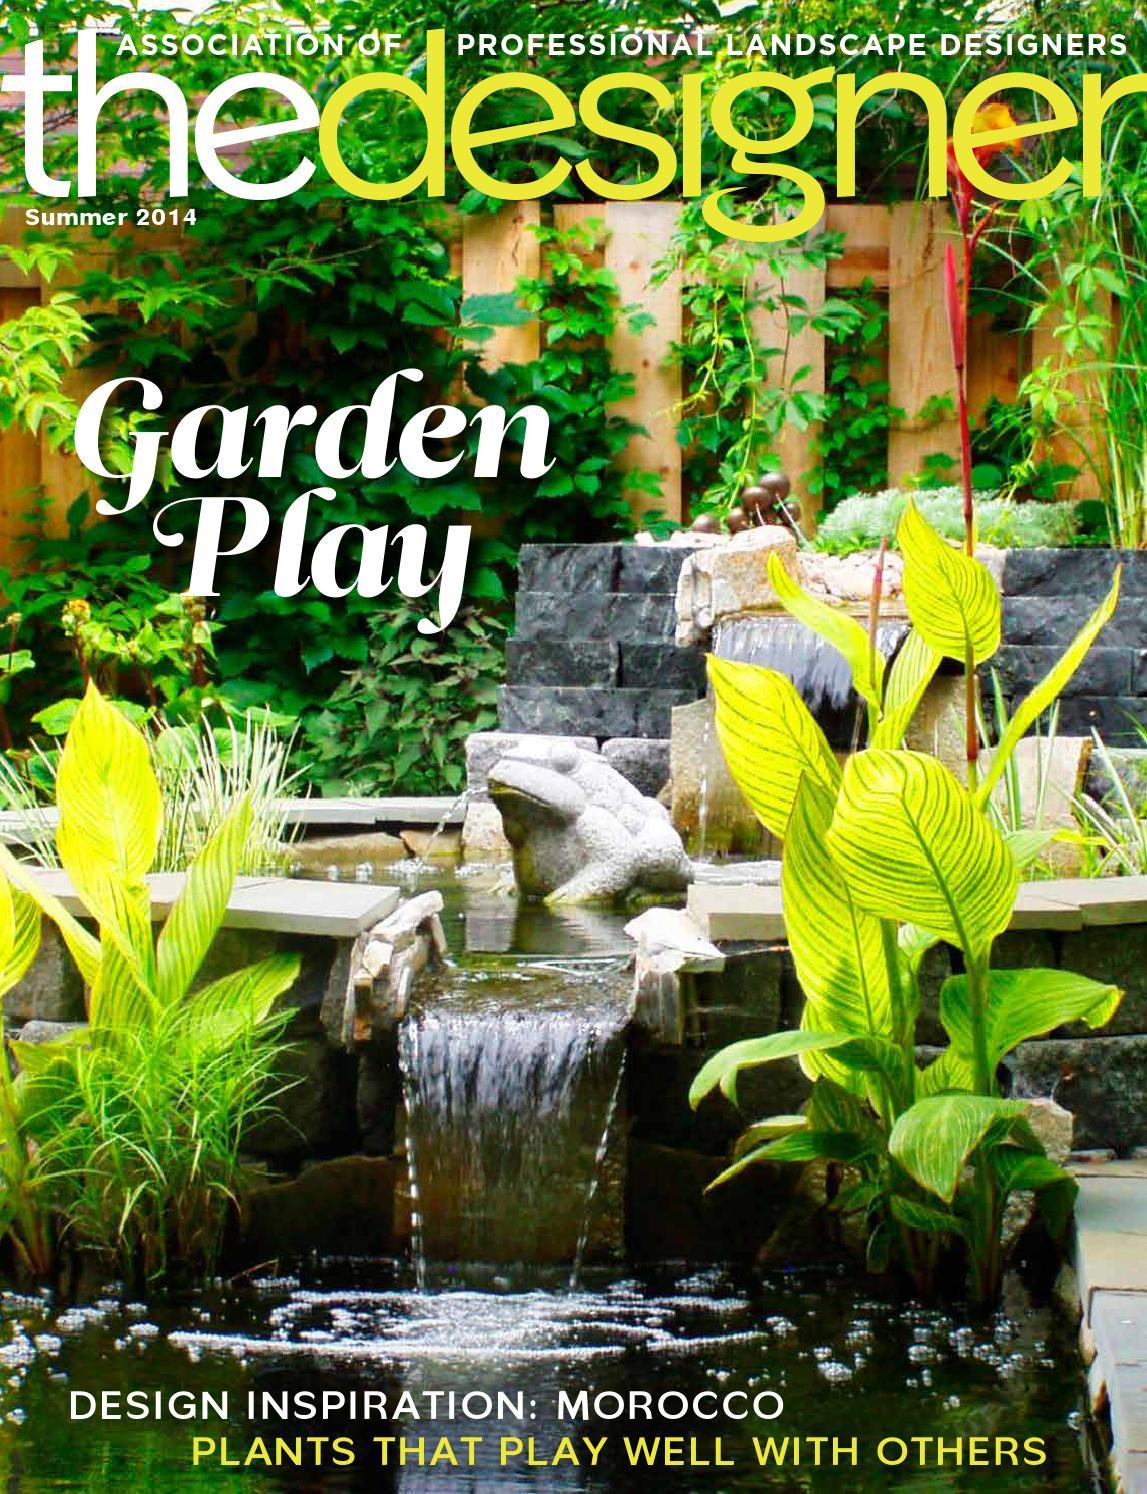 Association Of Professional Landscape Designers  APLD The Designer Summer 2014 by Association of